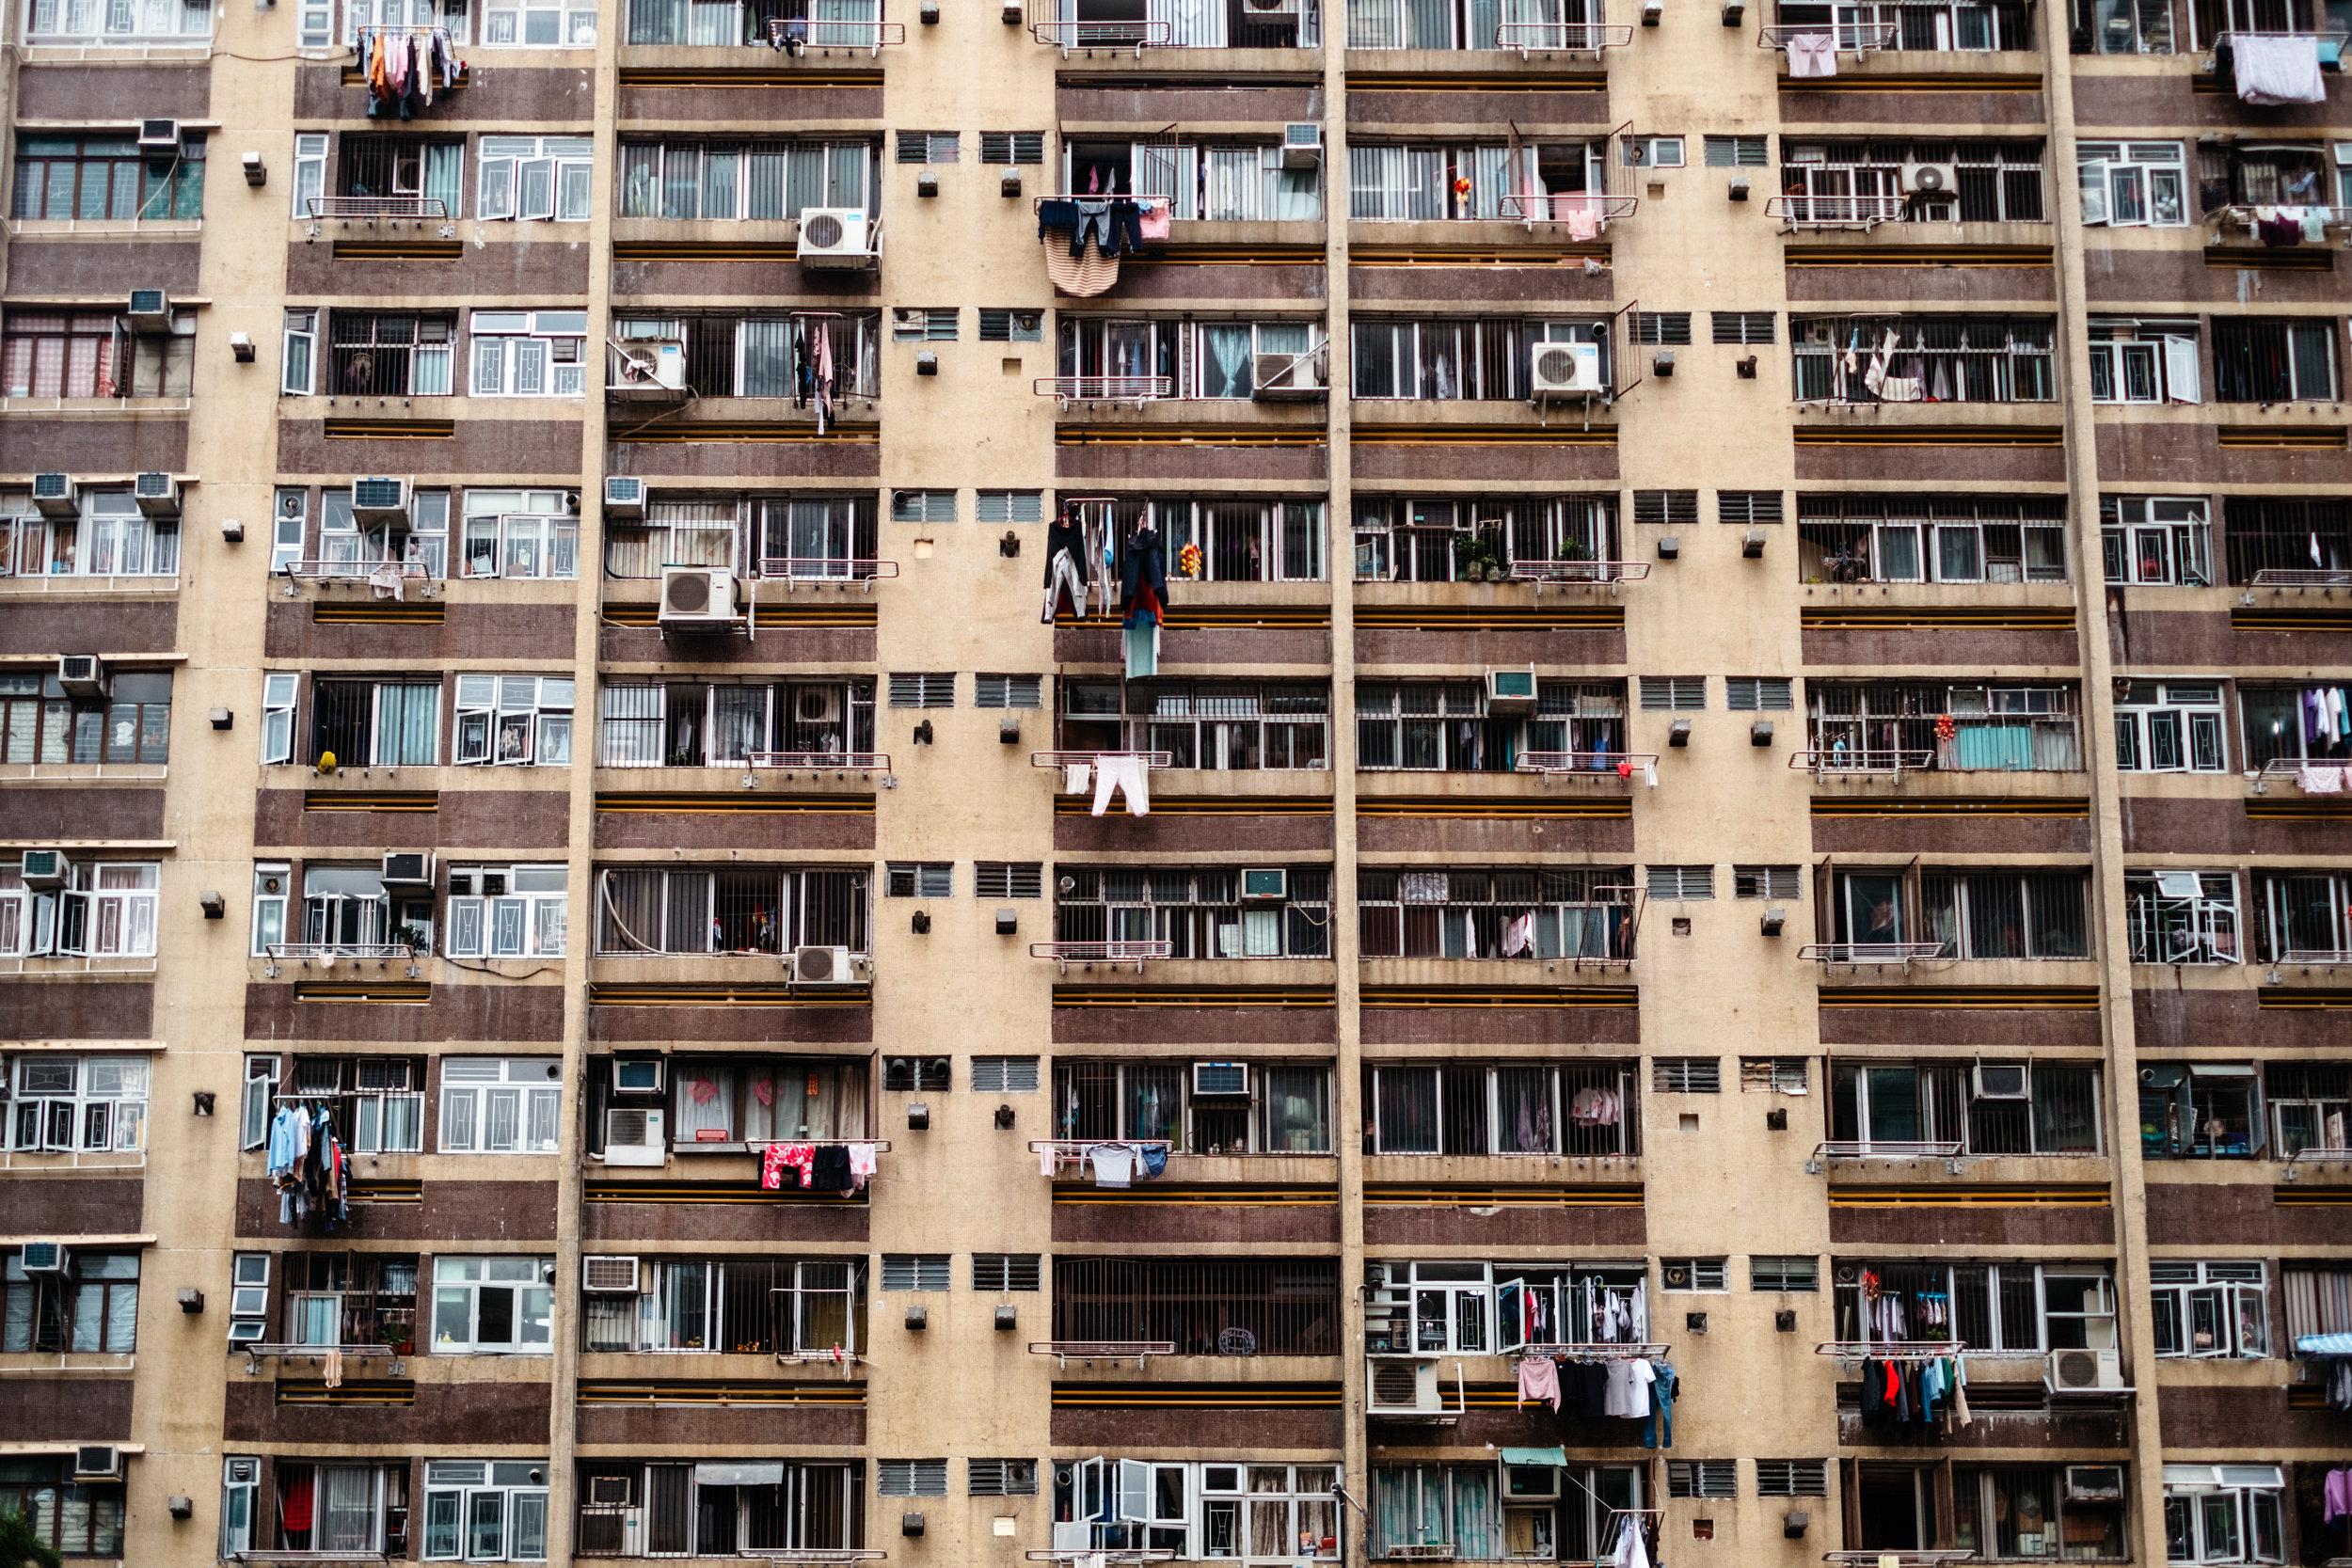 Hong Kong , X-Pro2, XF 35mm f/1.4 R @ f/2